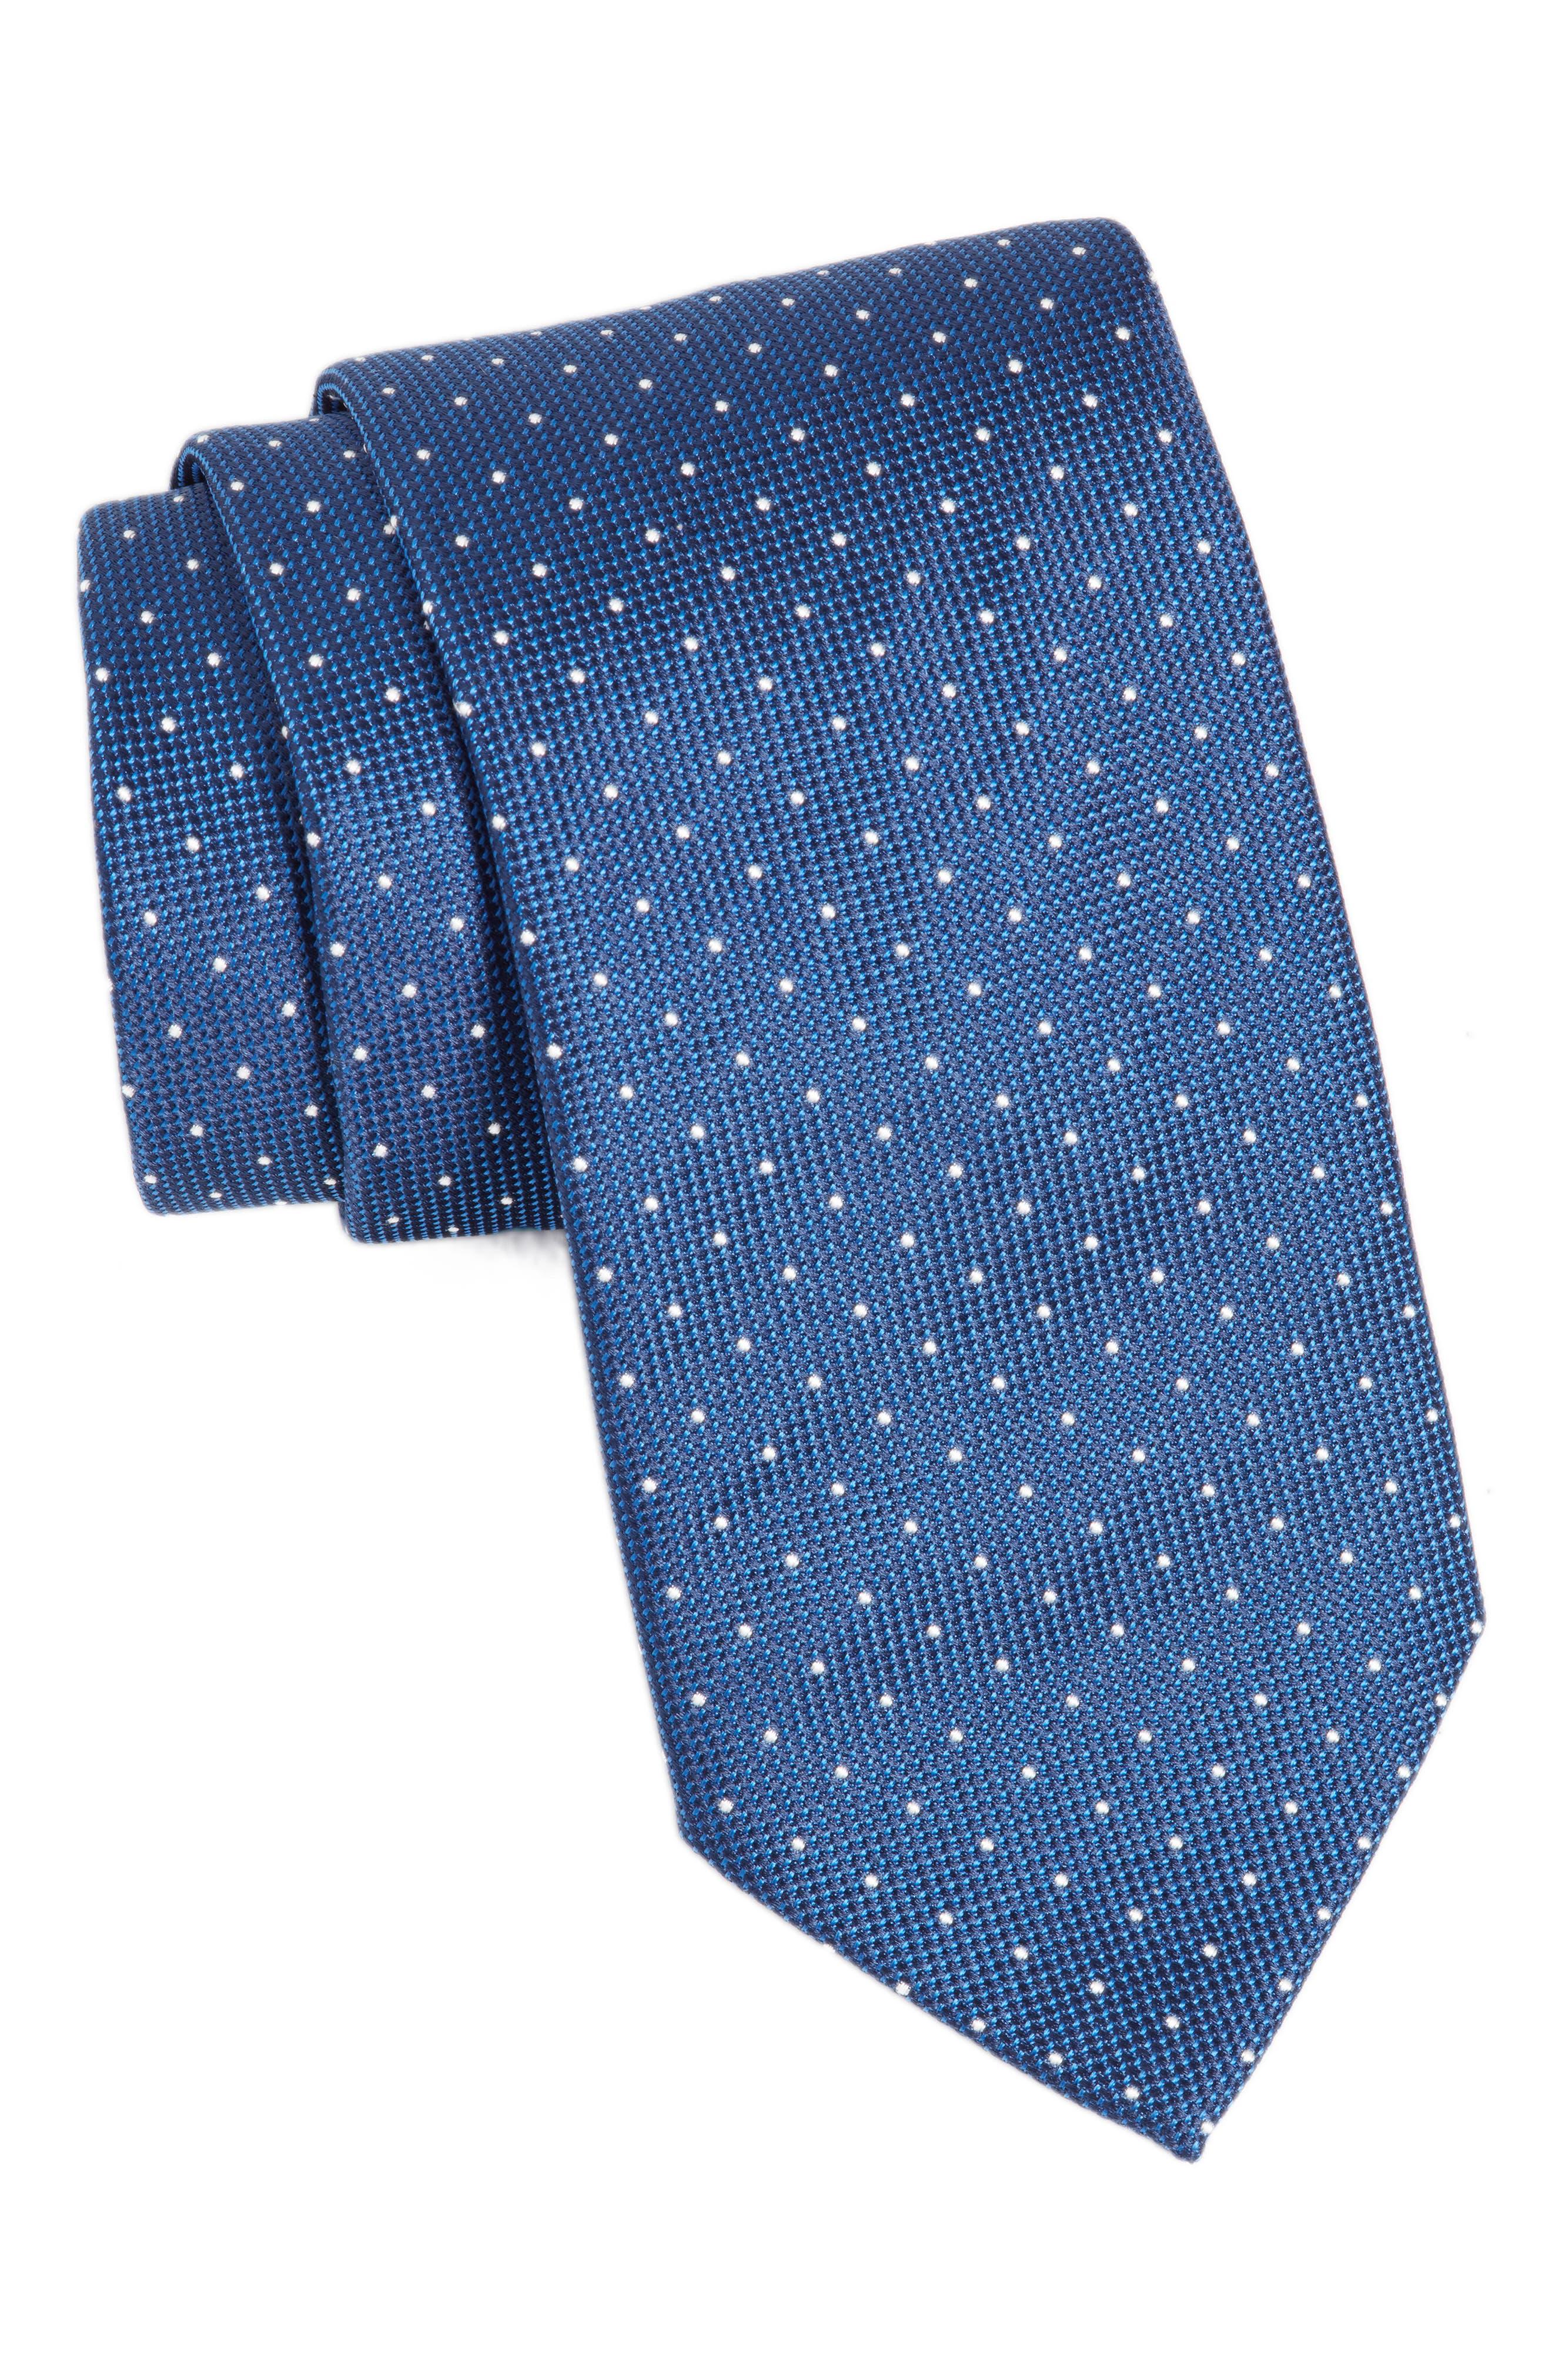 Dot Silk Tie,                             Main thumbnail 1, color,                             400